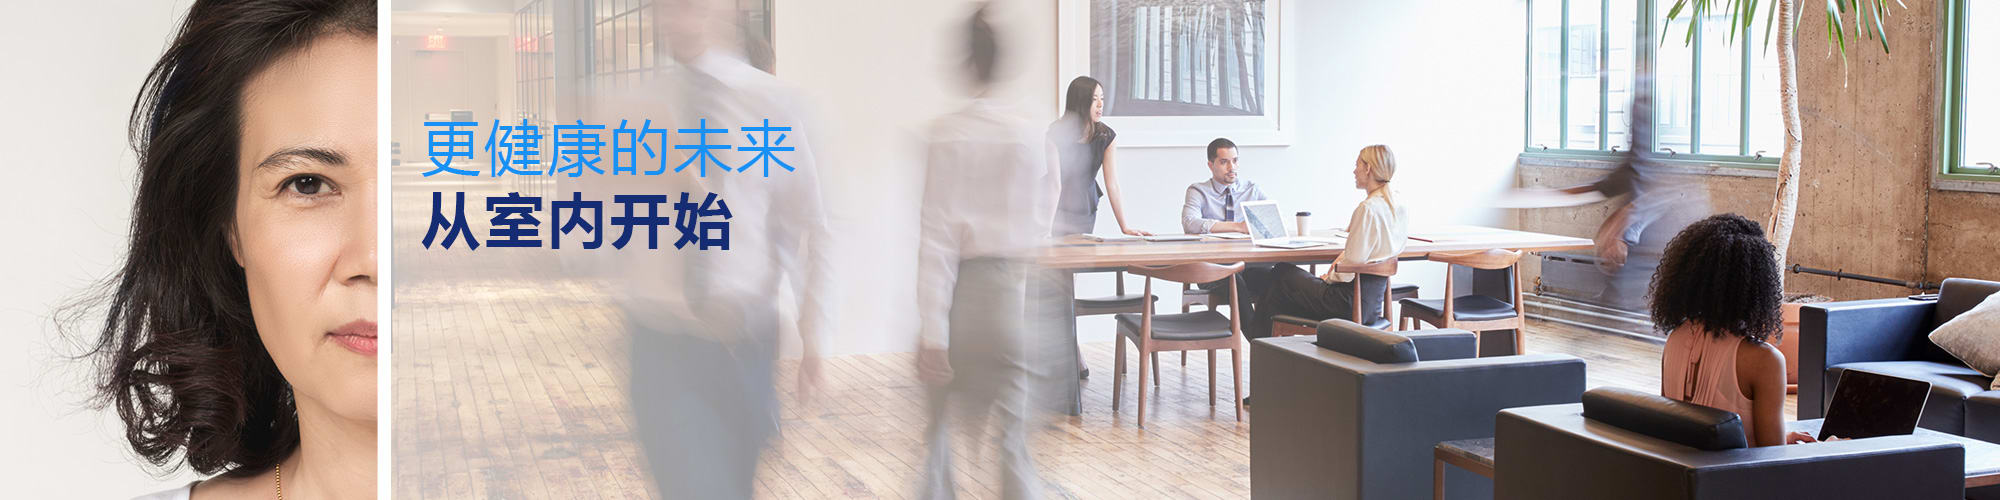 healthy-buildings-banner-image